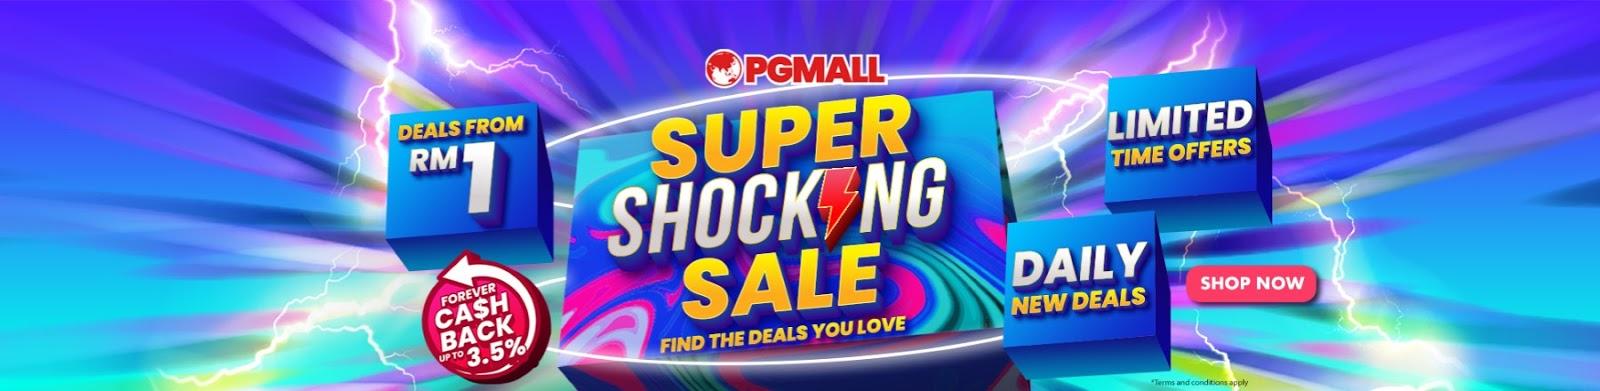 RM1 SUPER SHOCKING SALE HANYA DI PG MALL ONLINE! BERBALOI-BALOI..